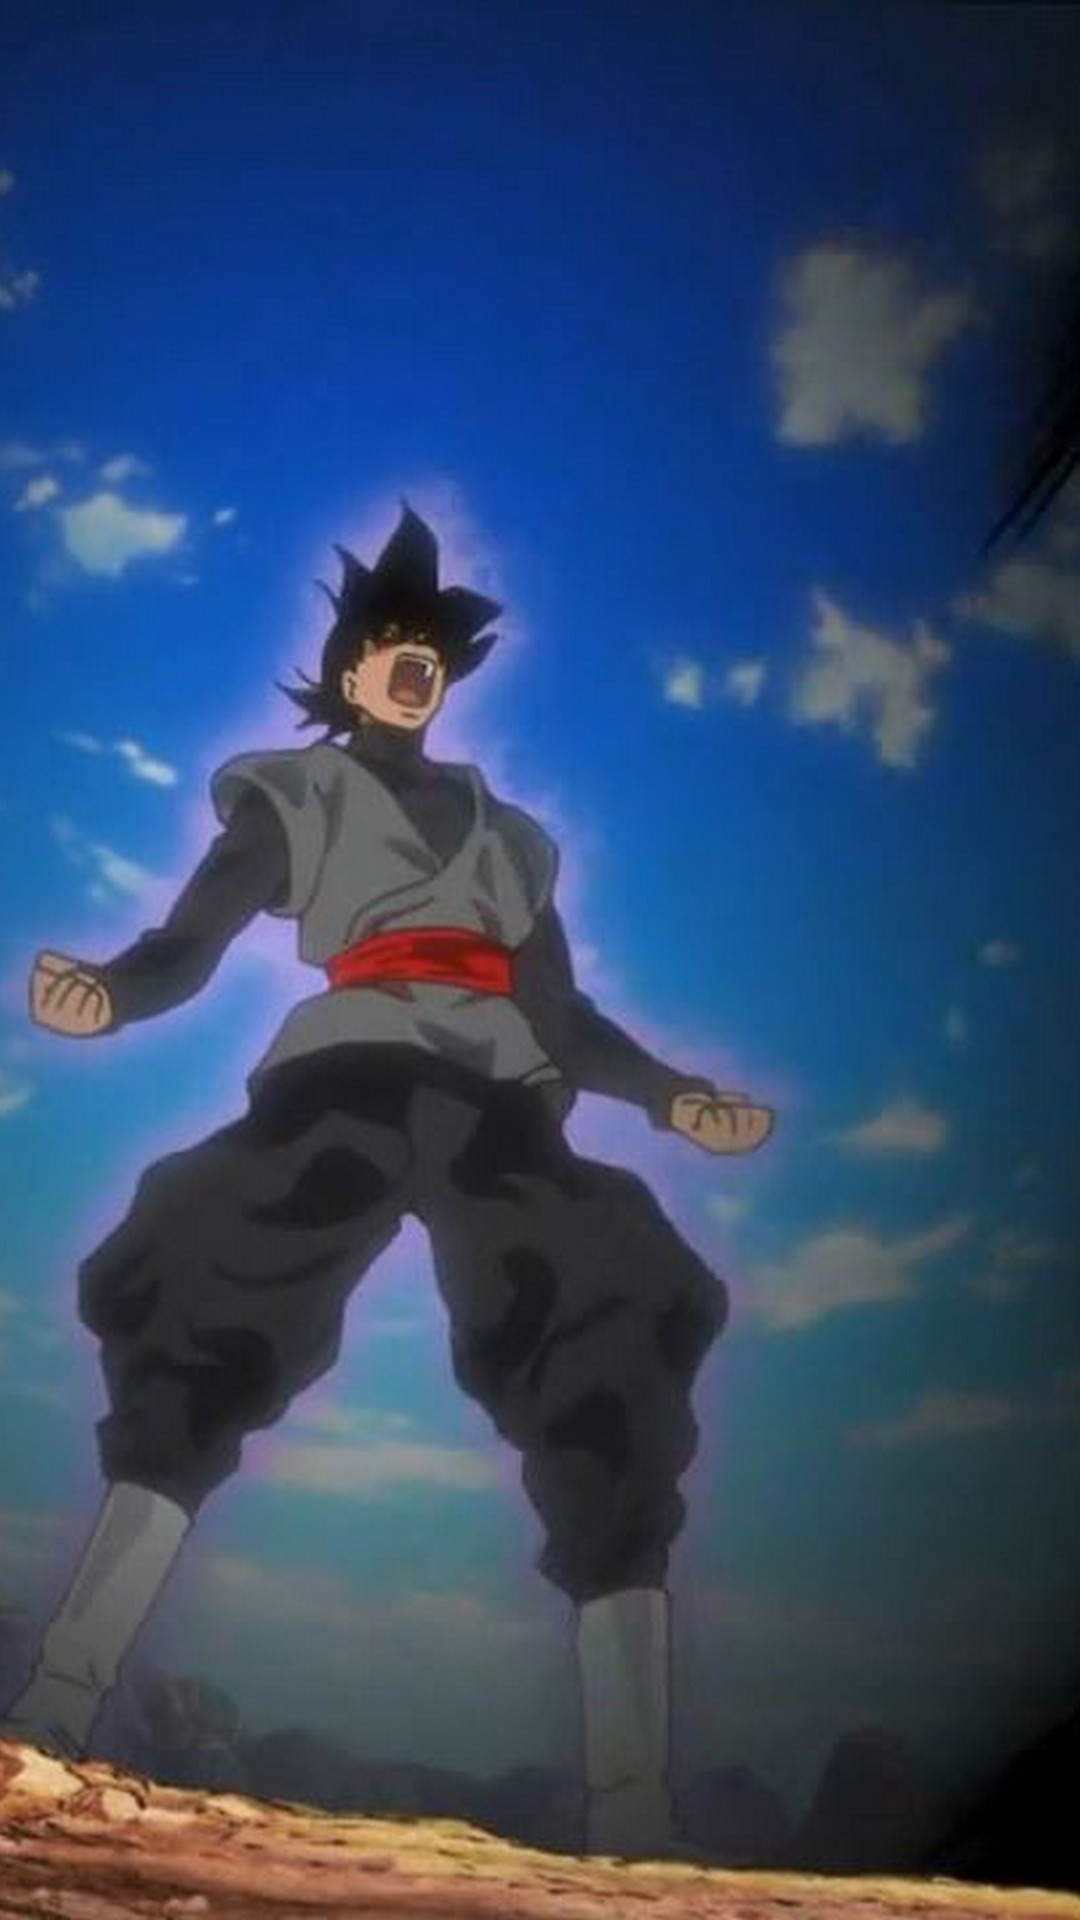 Black Goku Wallpaper Iphone 7 The Best Hd Wallpaper